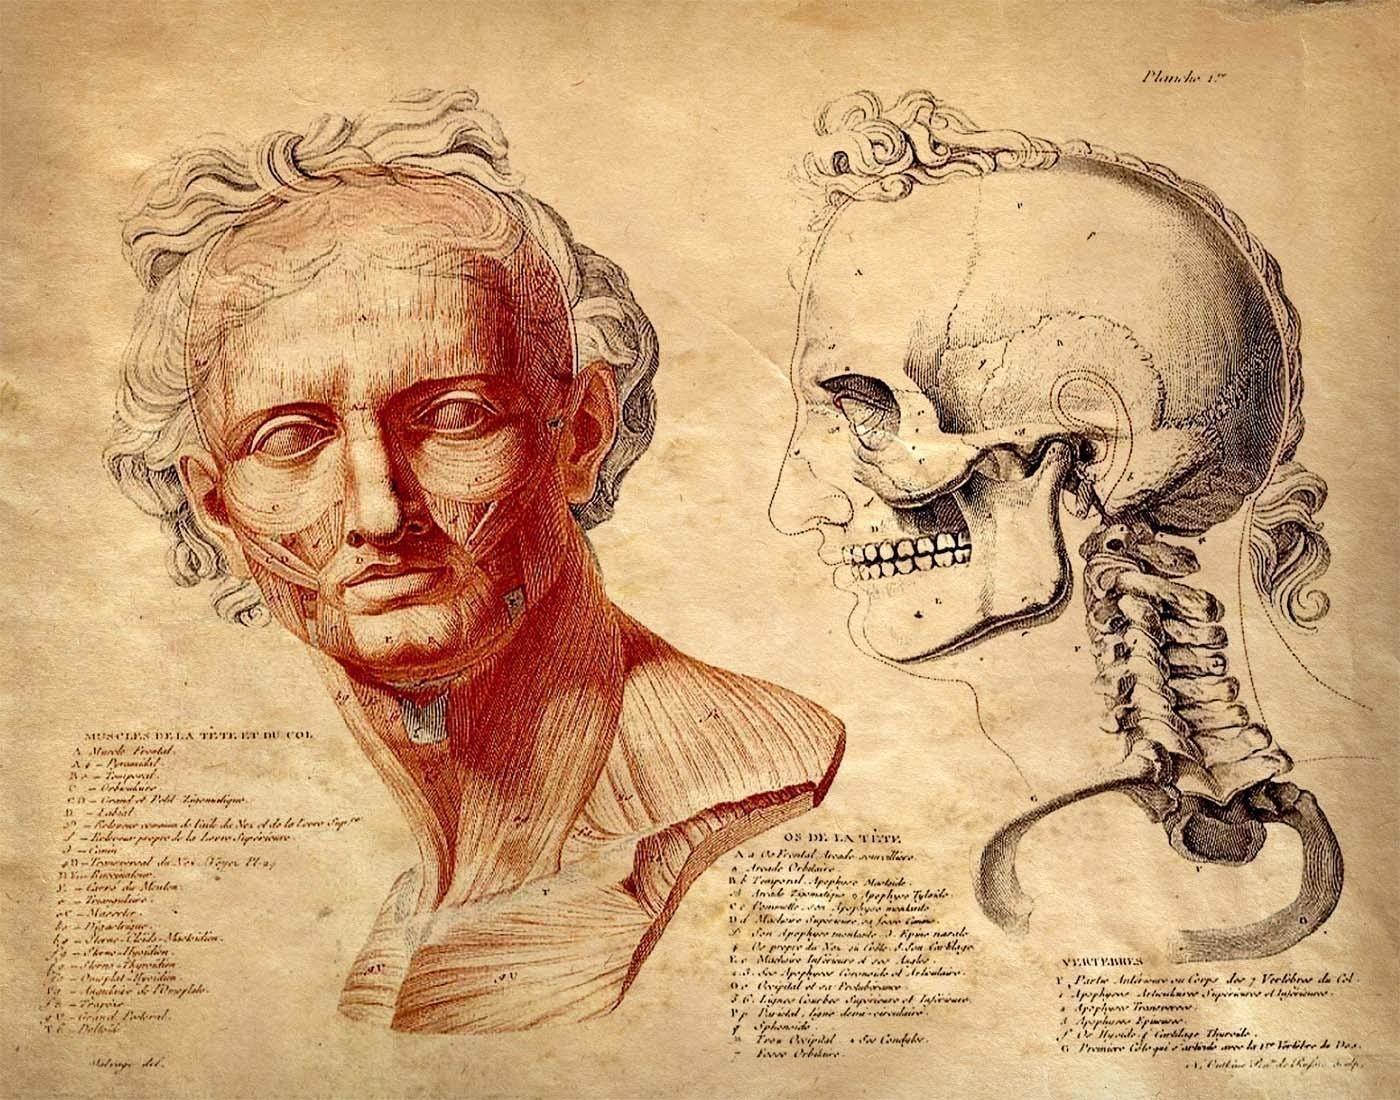 Vintage Anatomical Drawing HCV New Drugs: ...